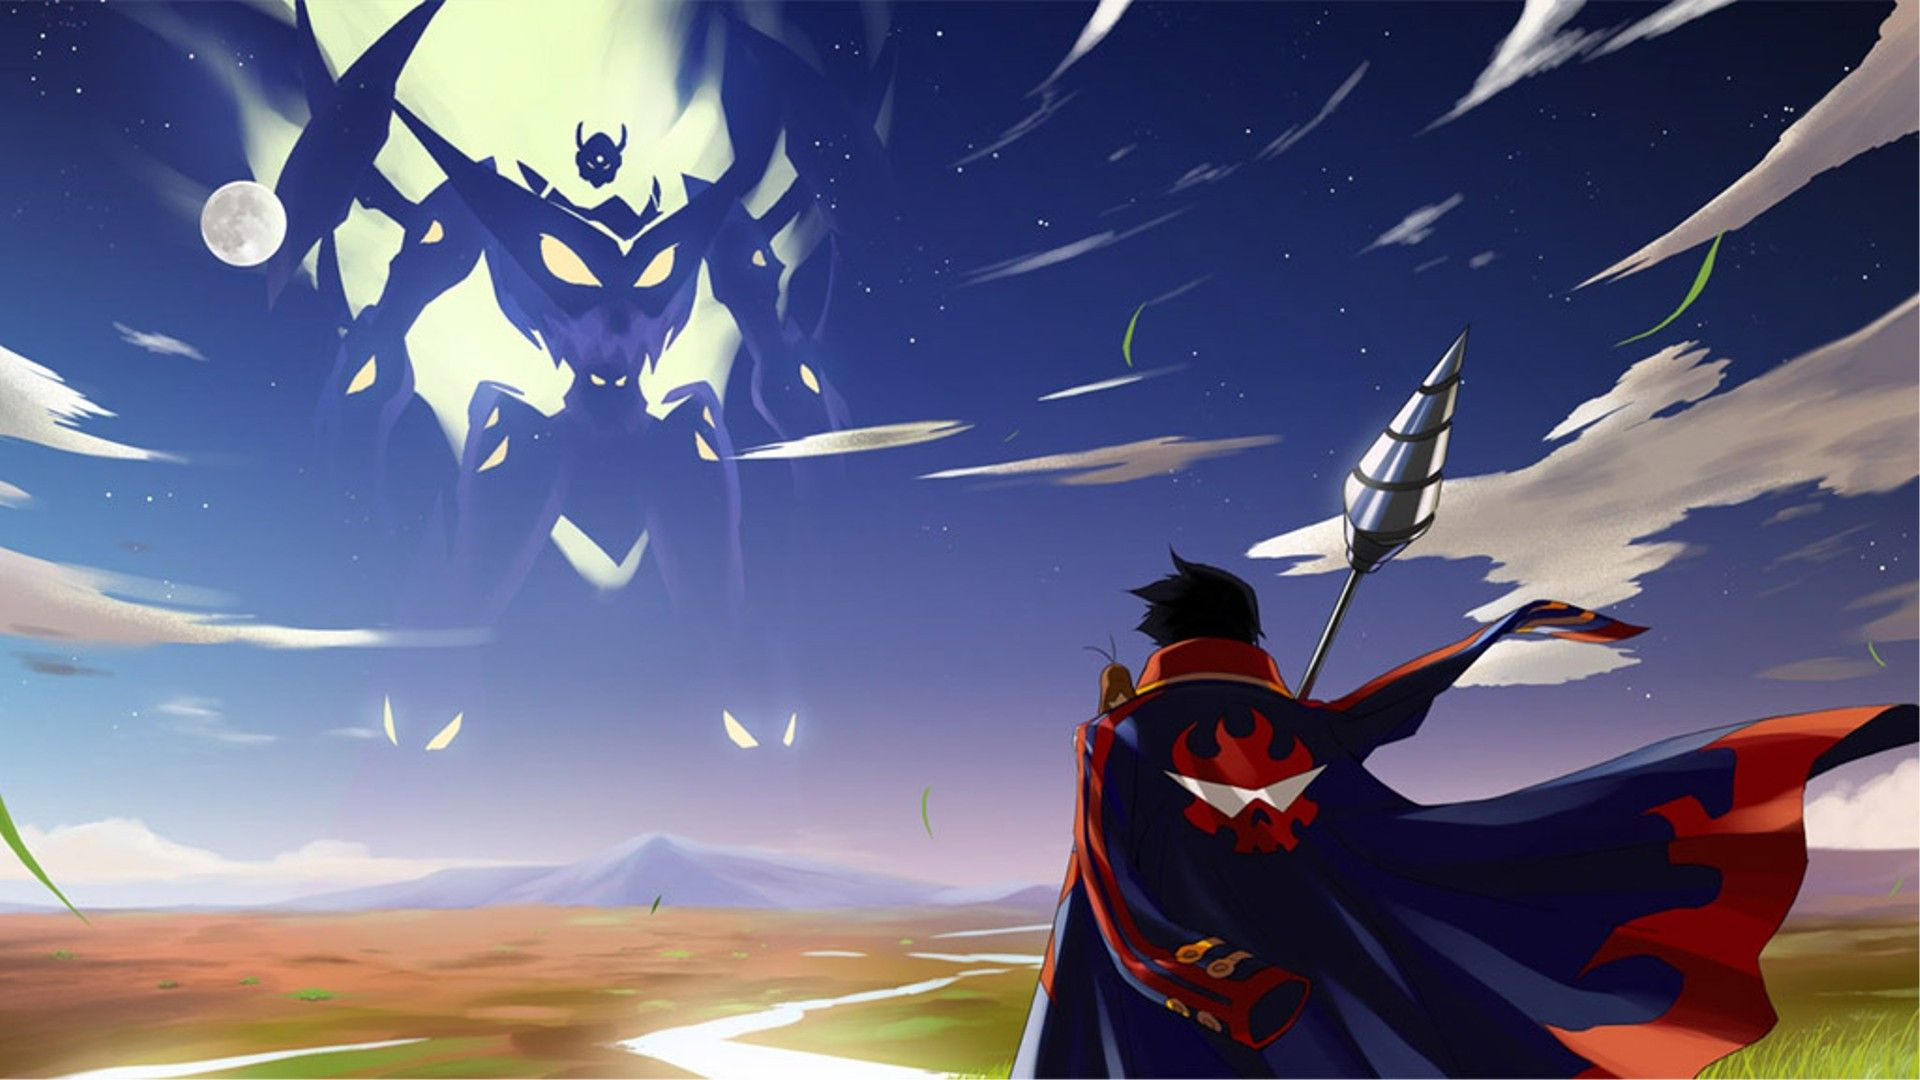 Wallpapers | Gurren lagann, Anime and Gundam